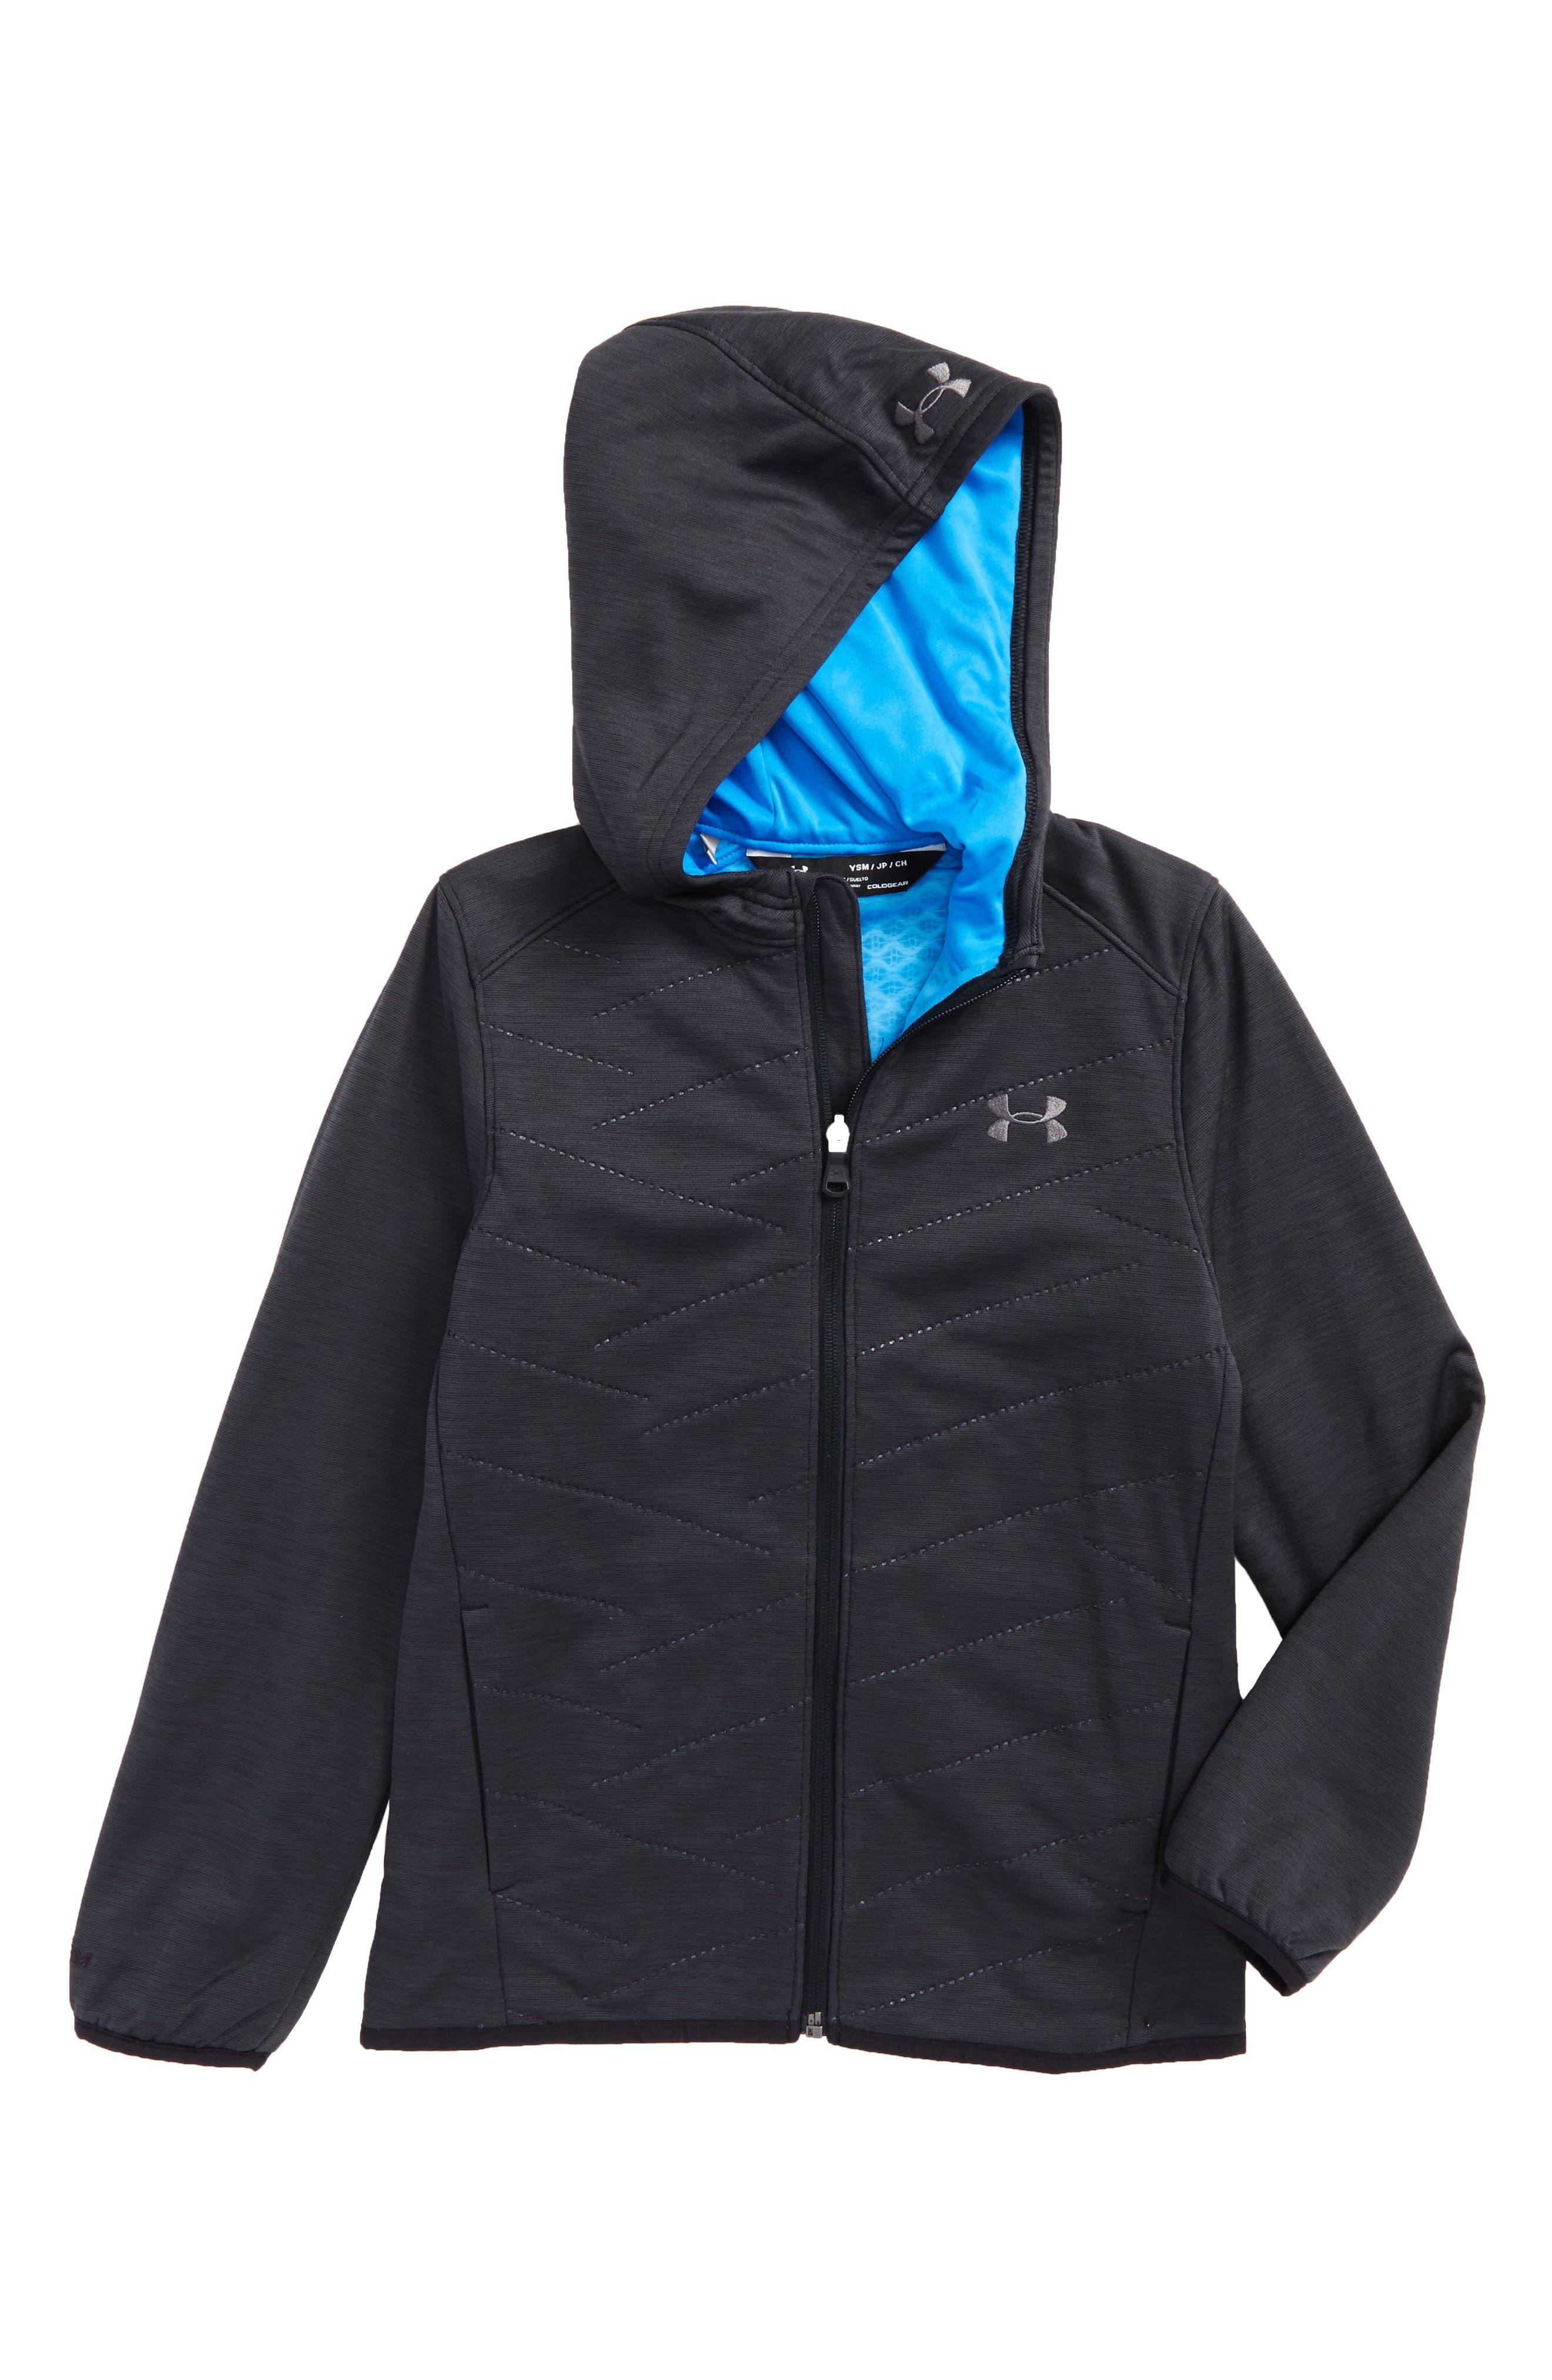 ColdGear<sup>®</sup> Reactor Hybrid Hooded Jacket,                         Main,                         color,